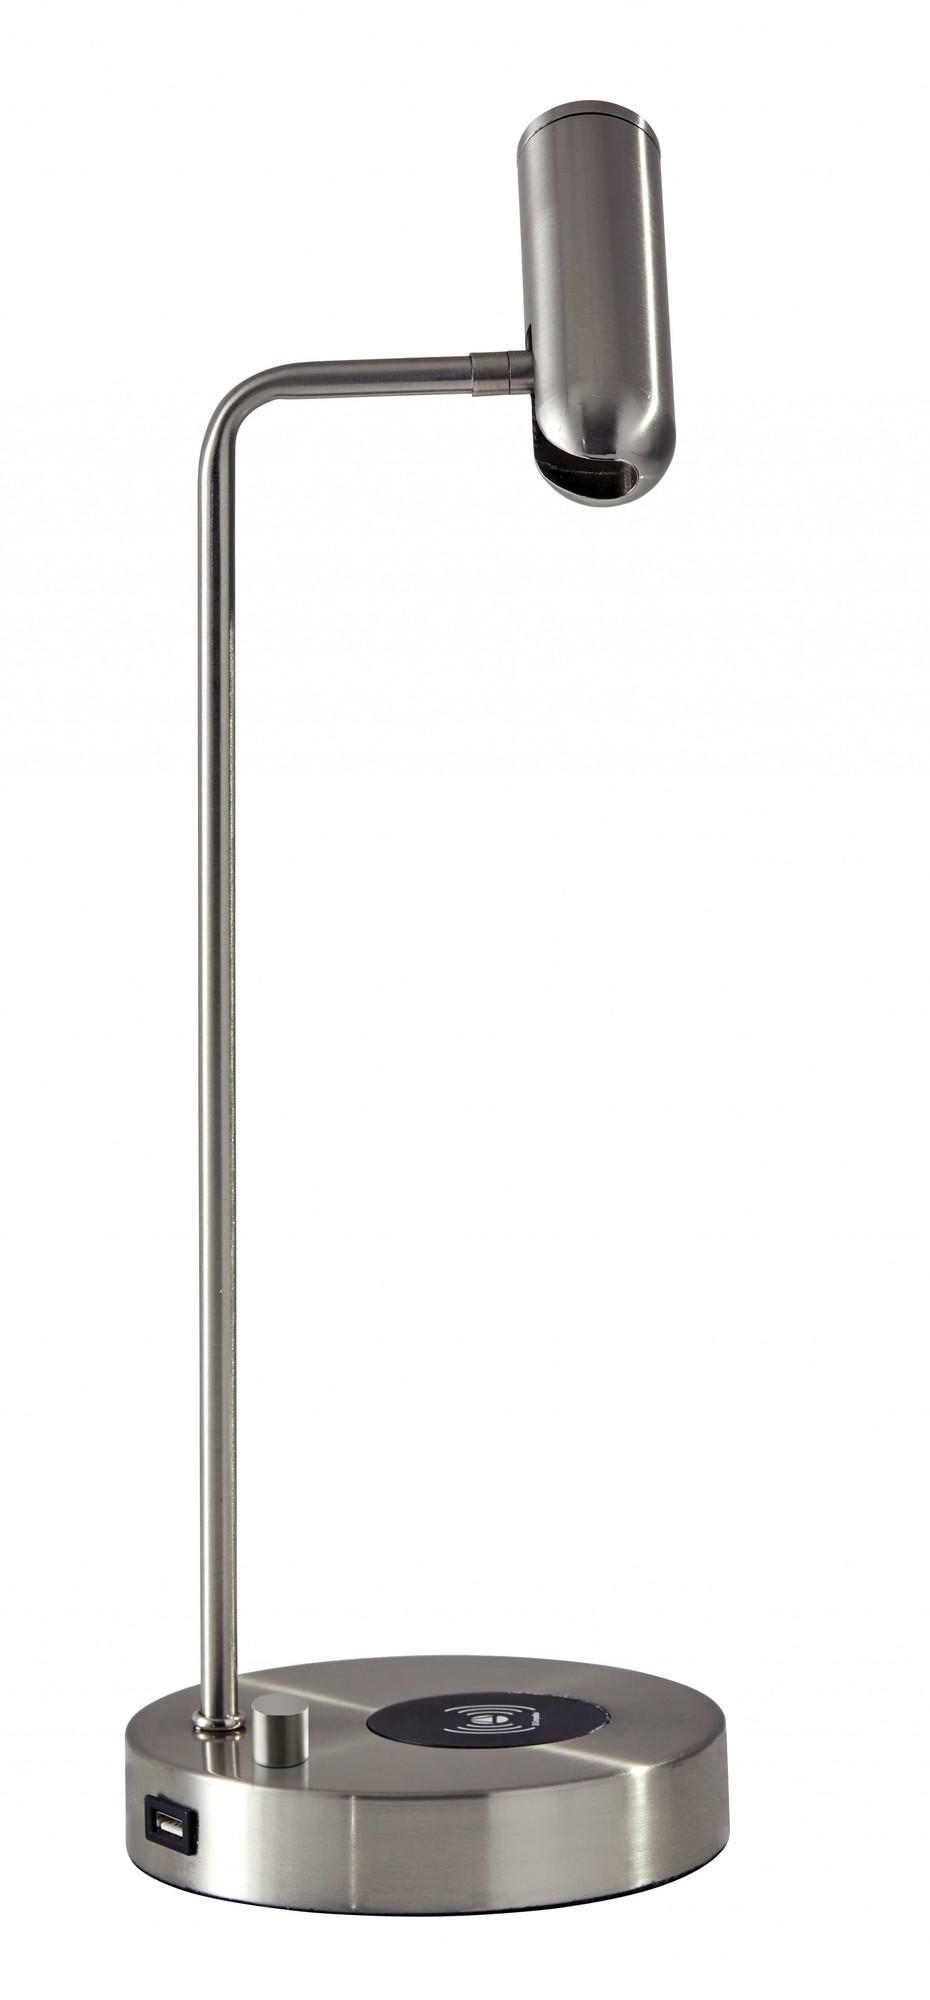 "6"" X 8"" X 16.5"" Brushed Steel Metal LED Desk Lamp"